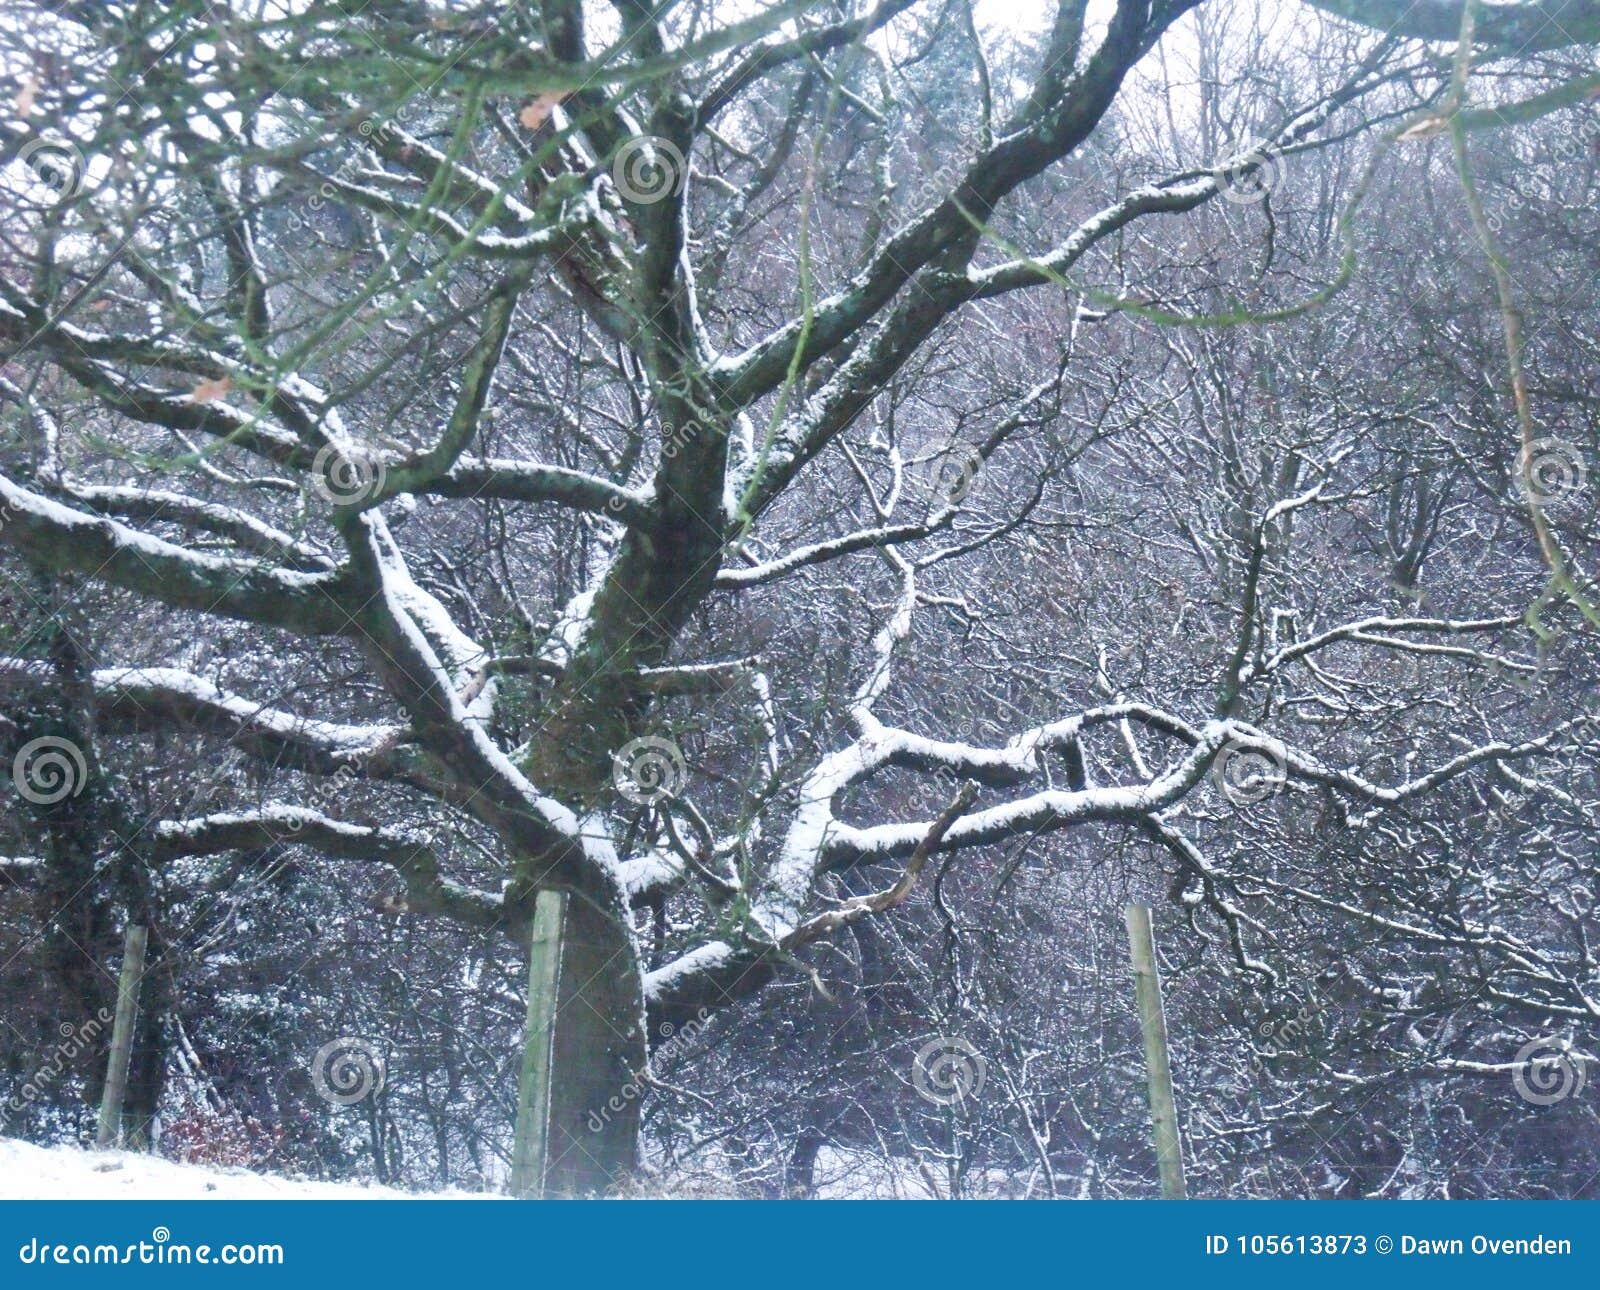 Descubra, nieve árbol cargado